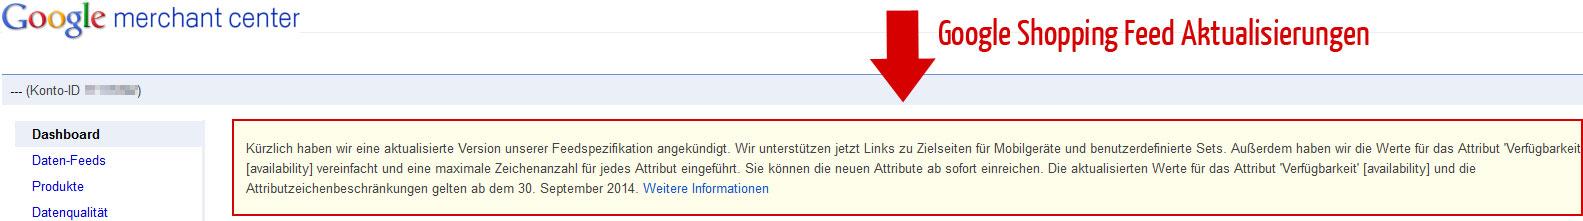 google-shopping-feed-aktualisierungen